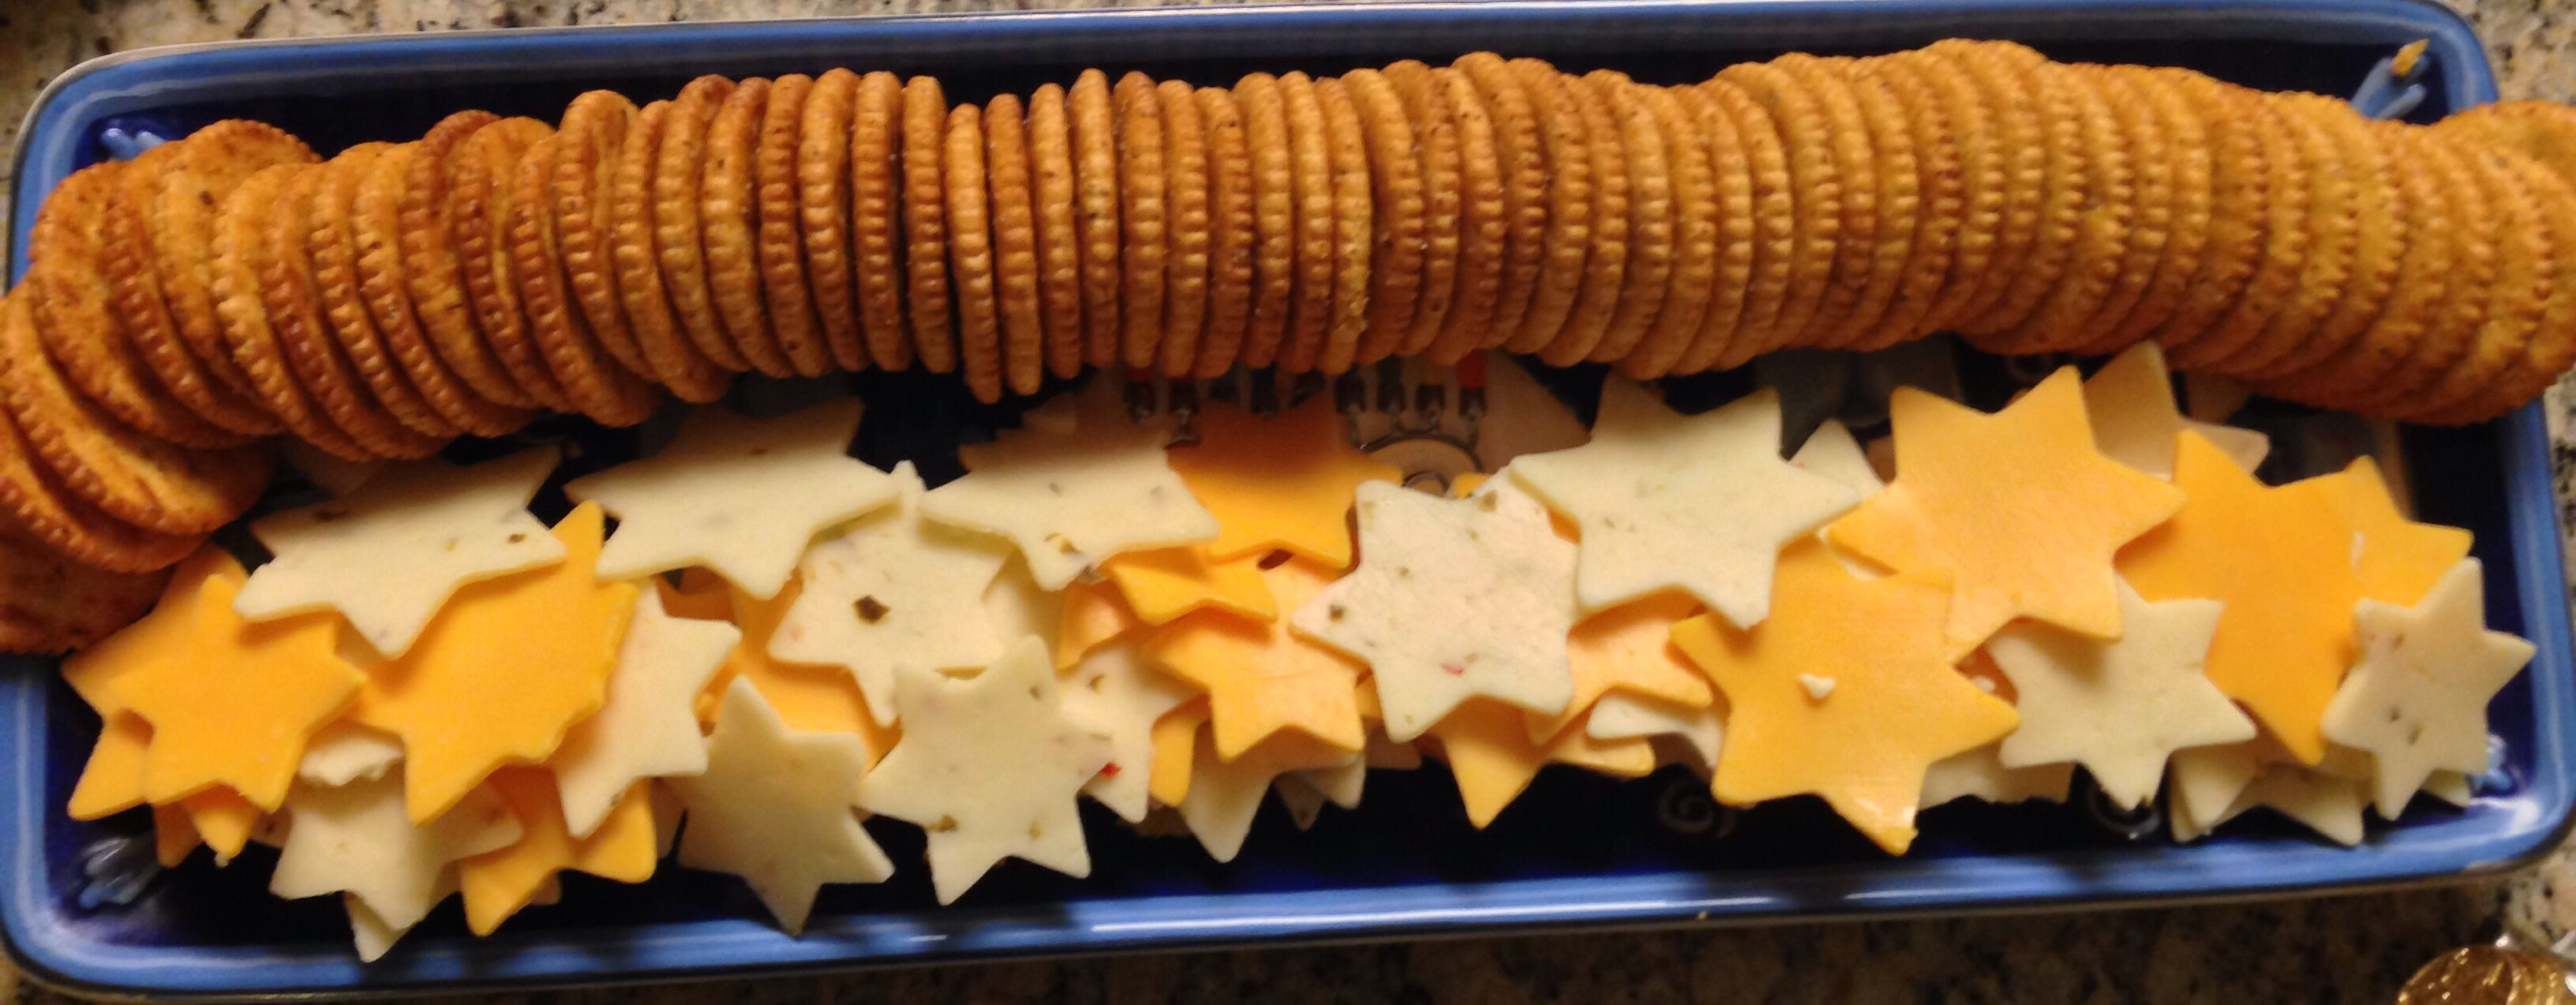 Star Of David Cheese And Crackers Hanukkah Food Cheese